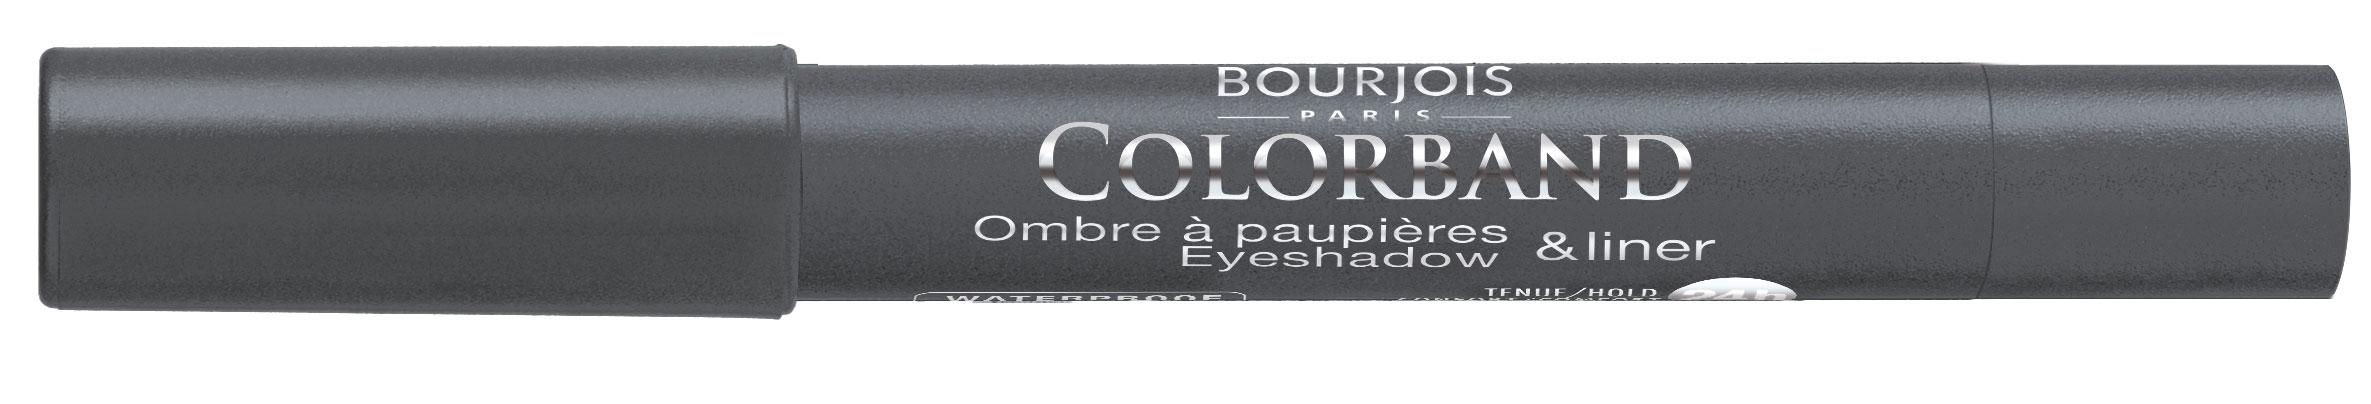 Colorband, tono 06 Gris Graffiti.